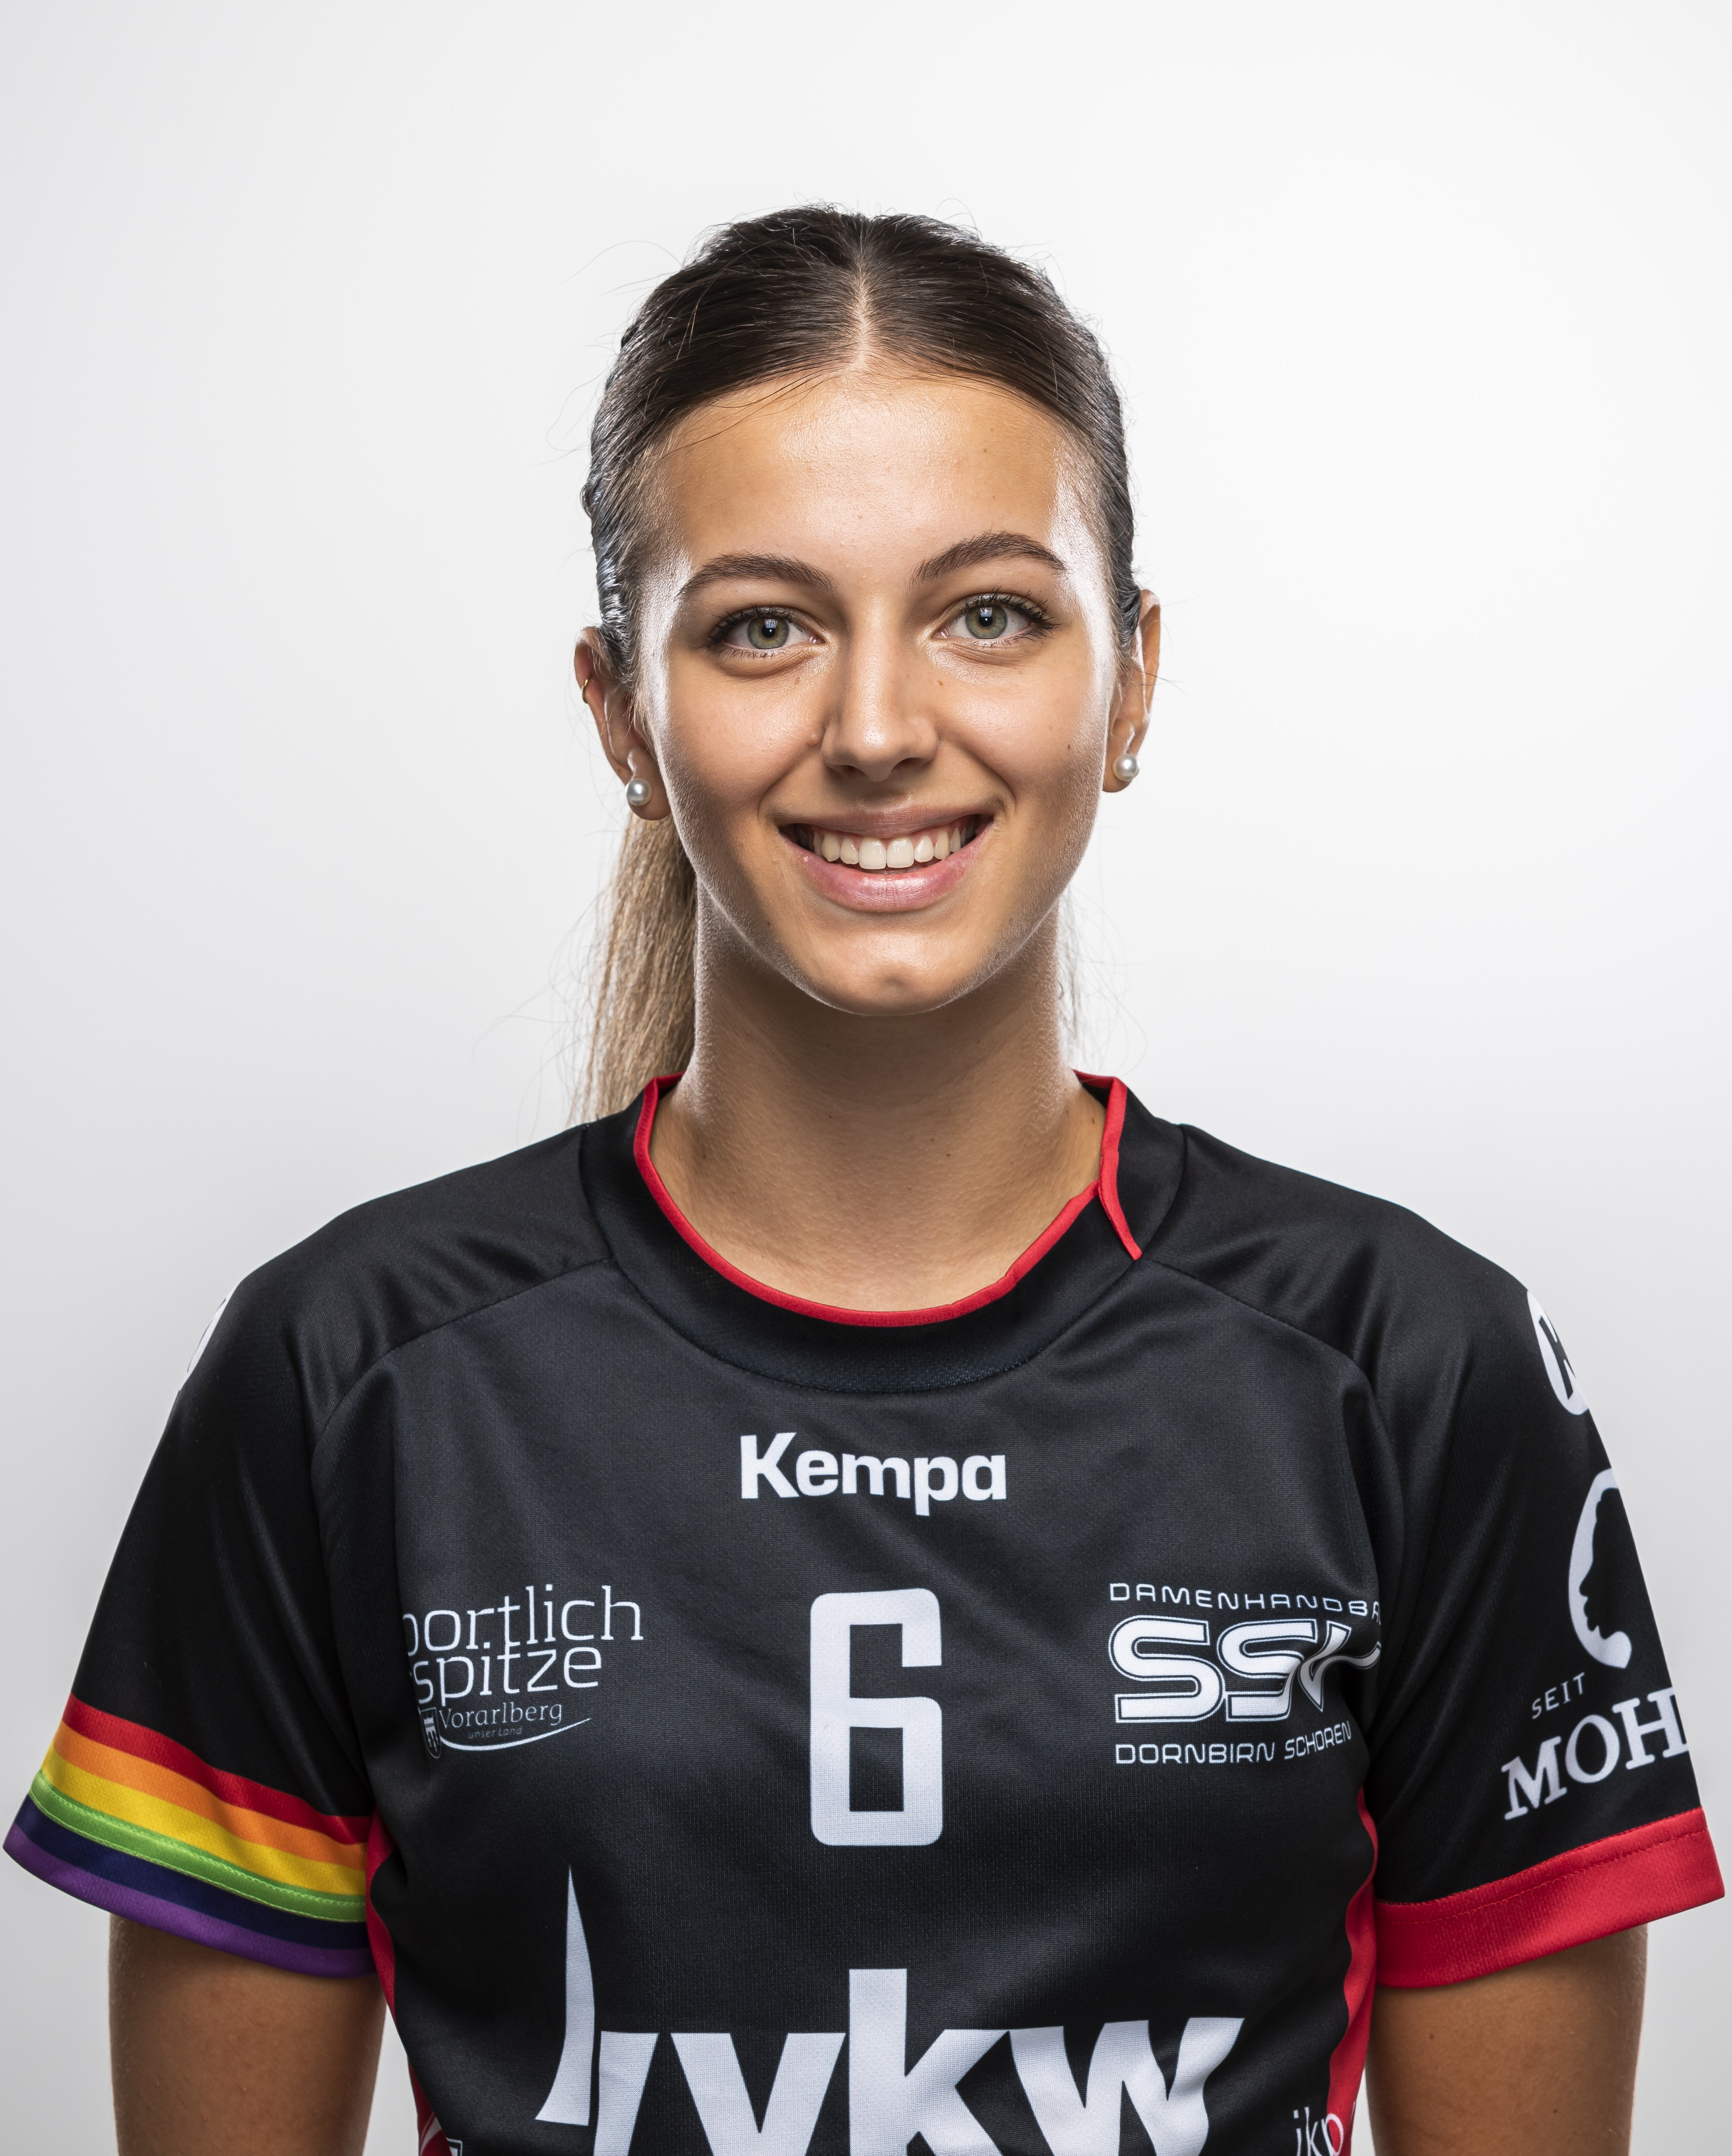 Sara Kojic